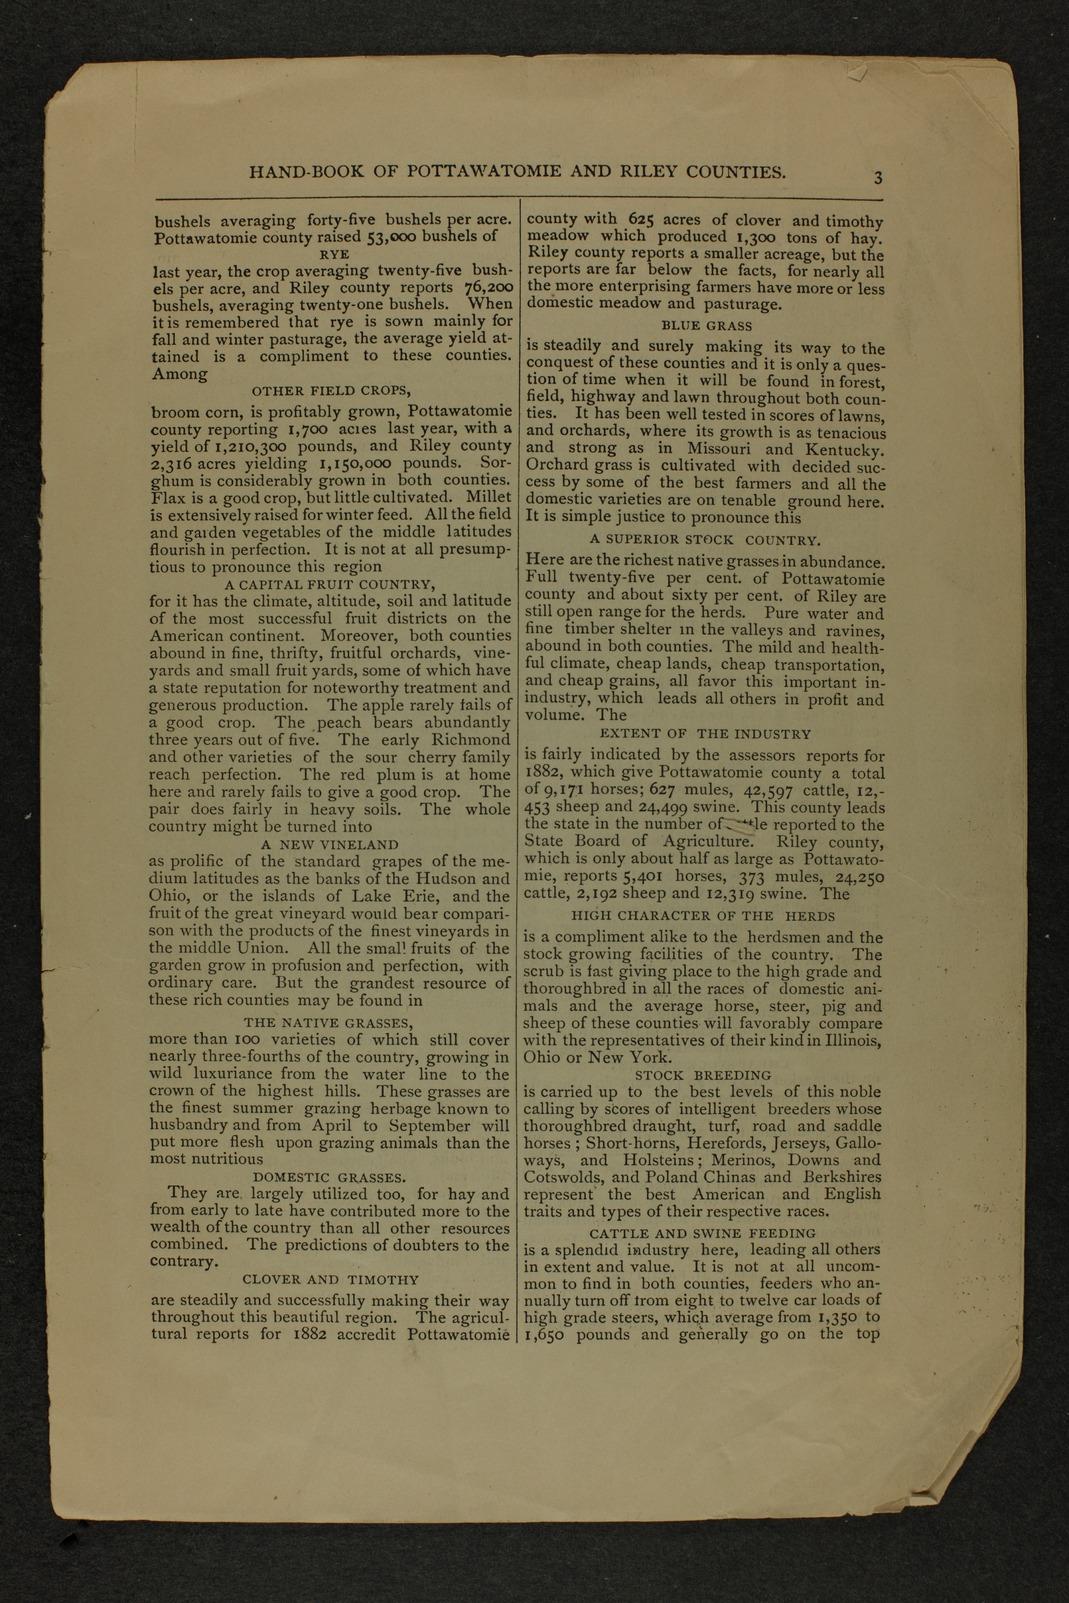 Handbook of Pottawatomie and Riley Counties, Kansas - page 3